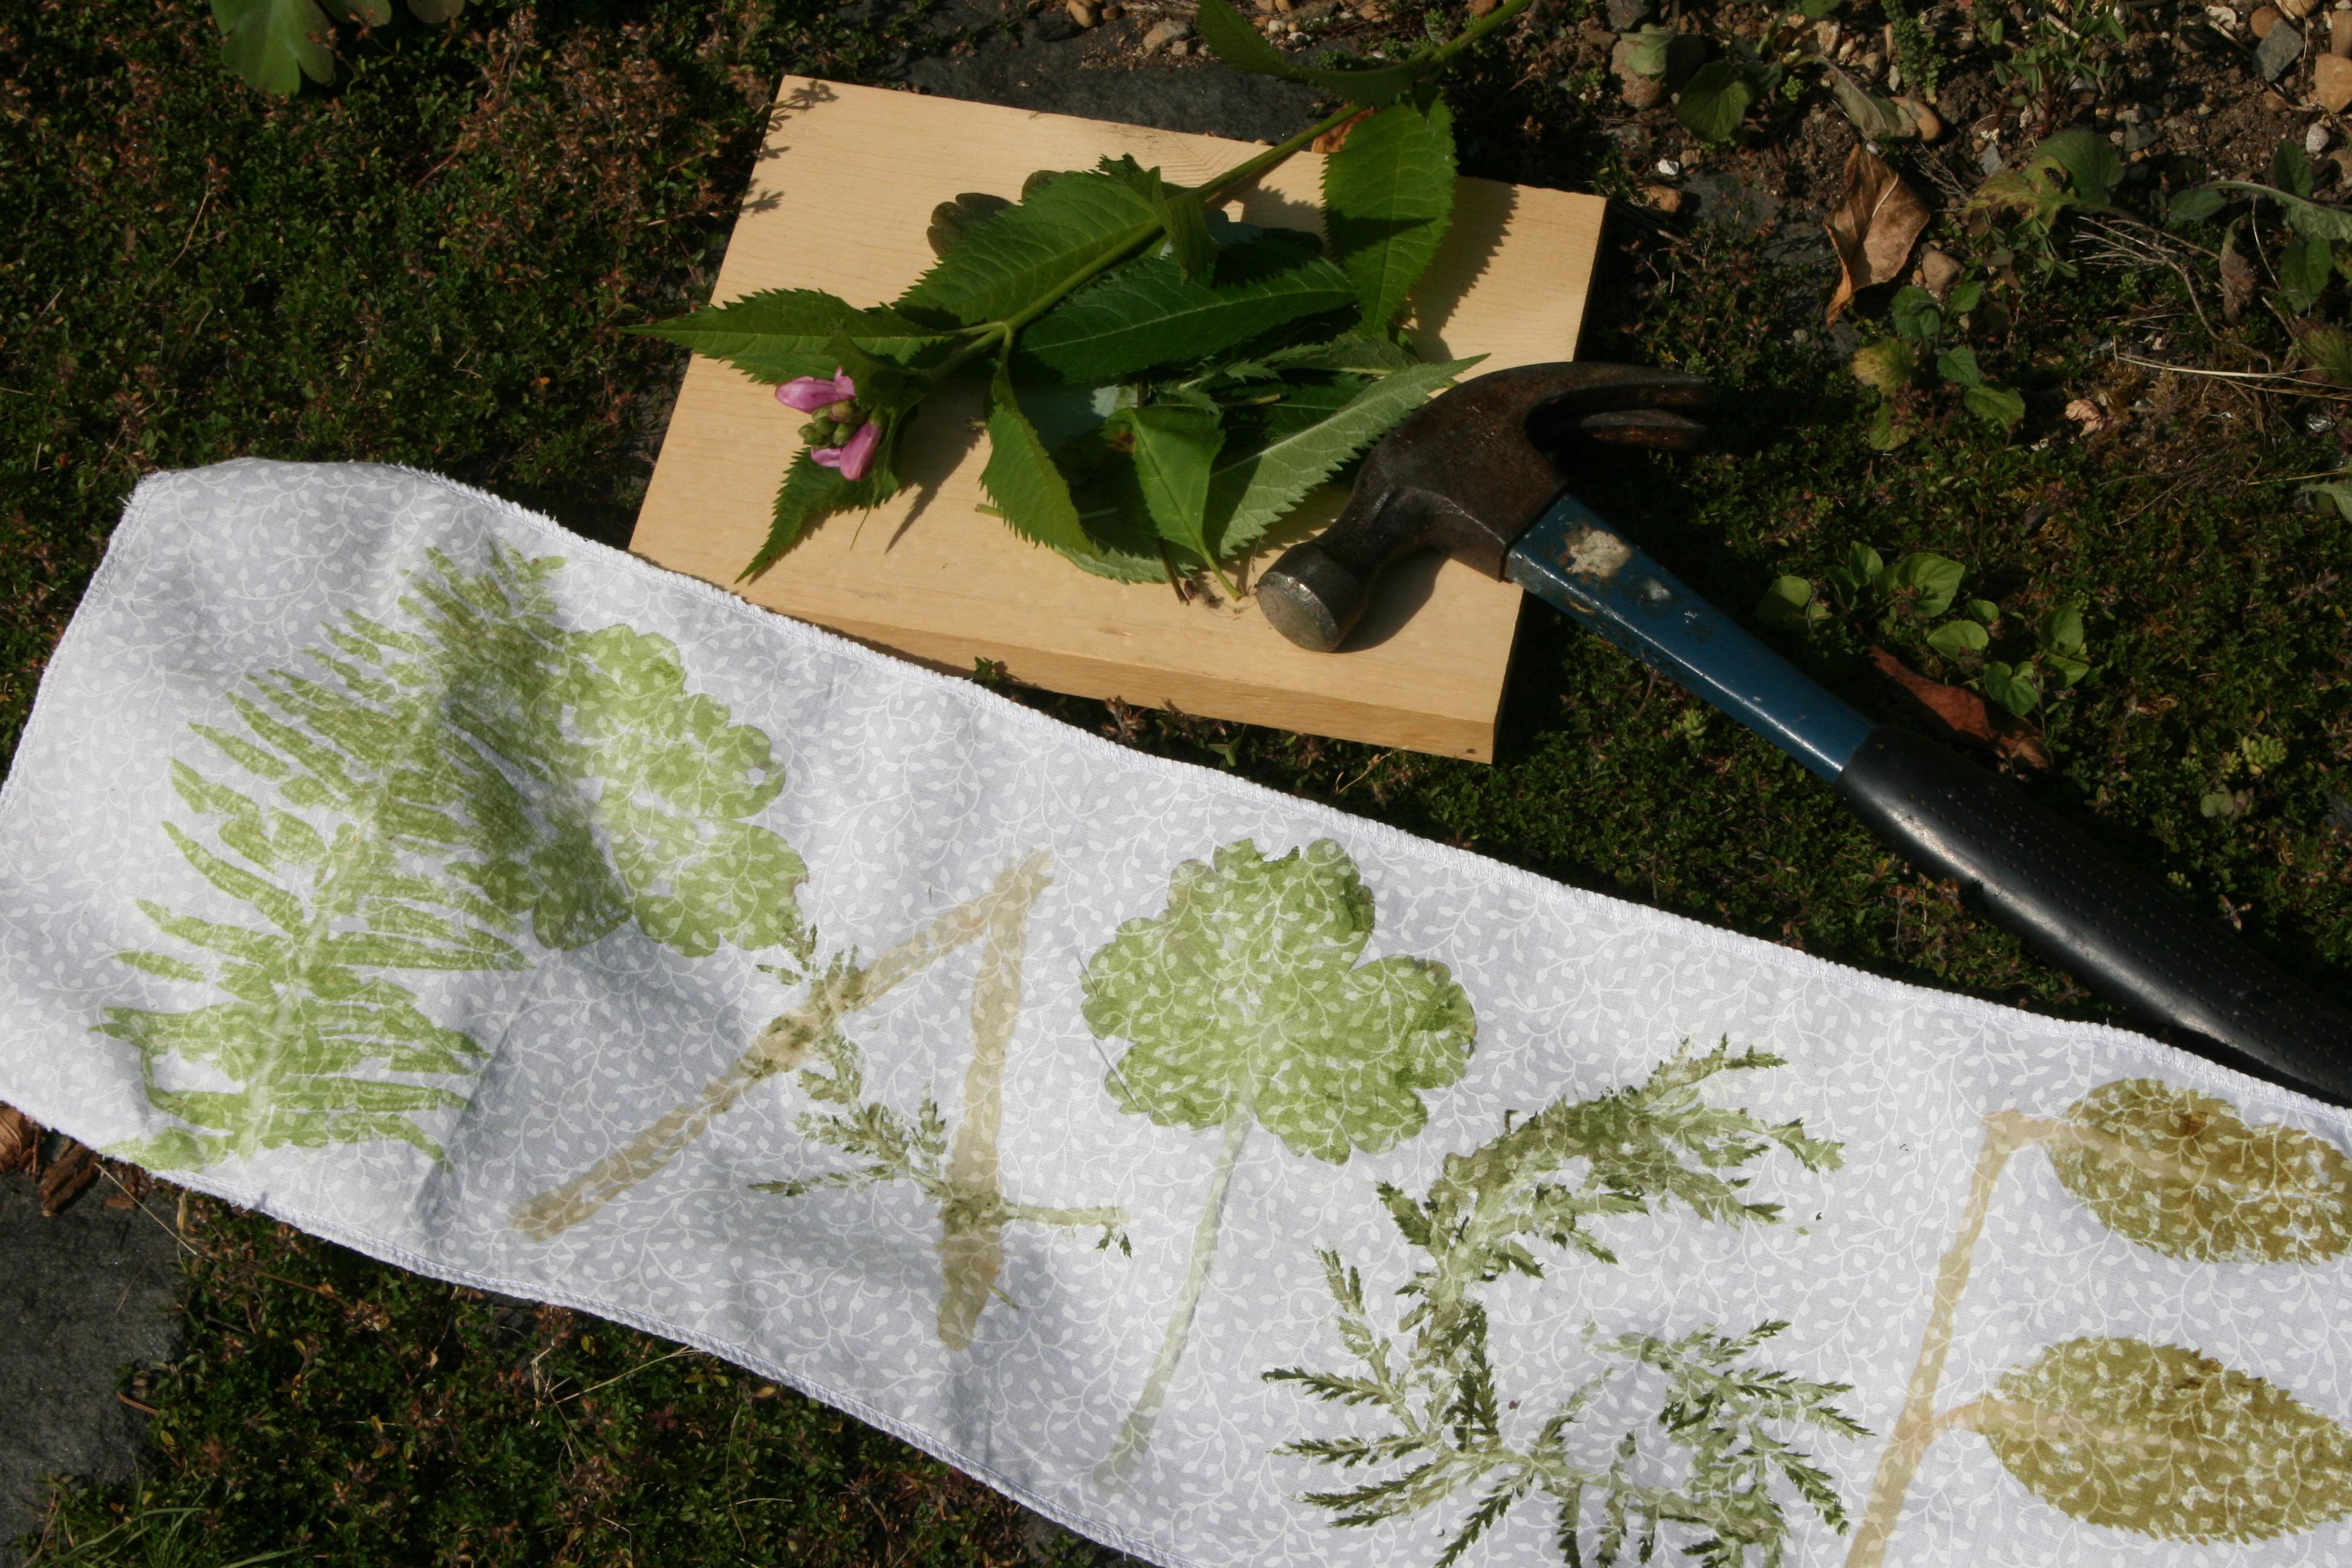 Hammering: Natural Fabric Dye